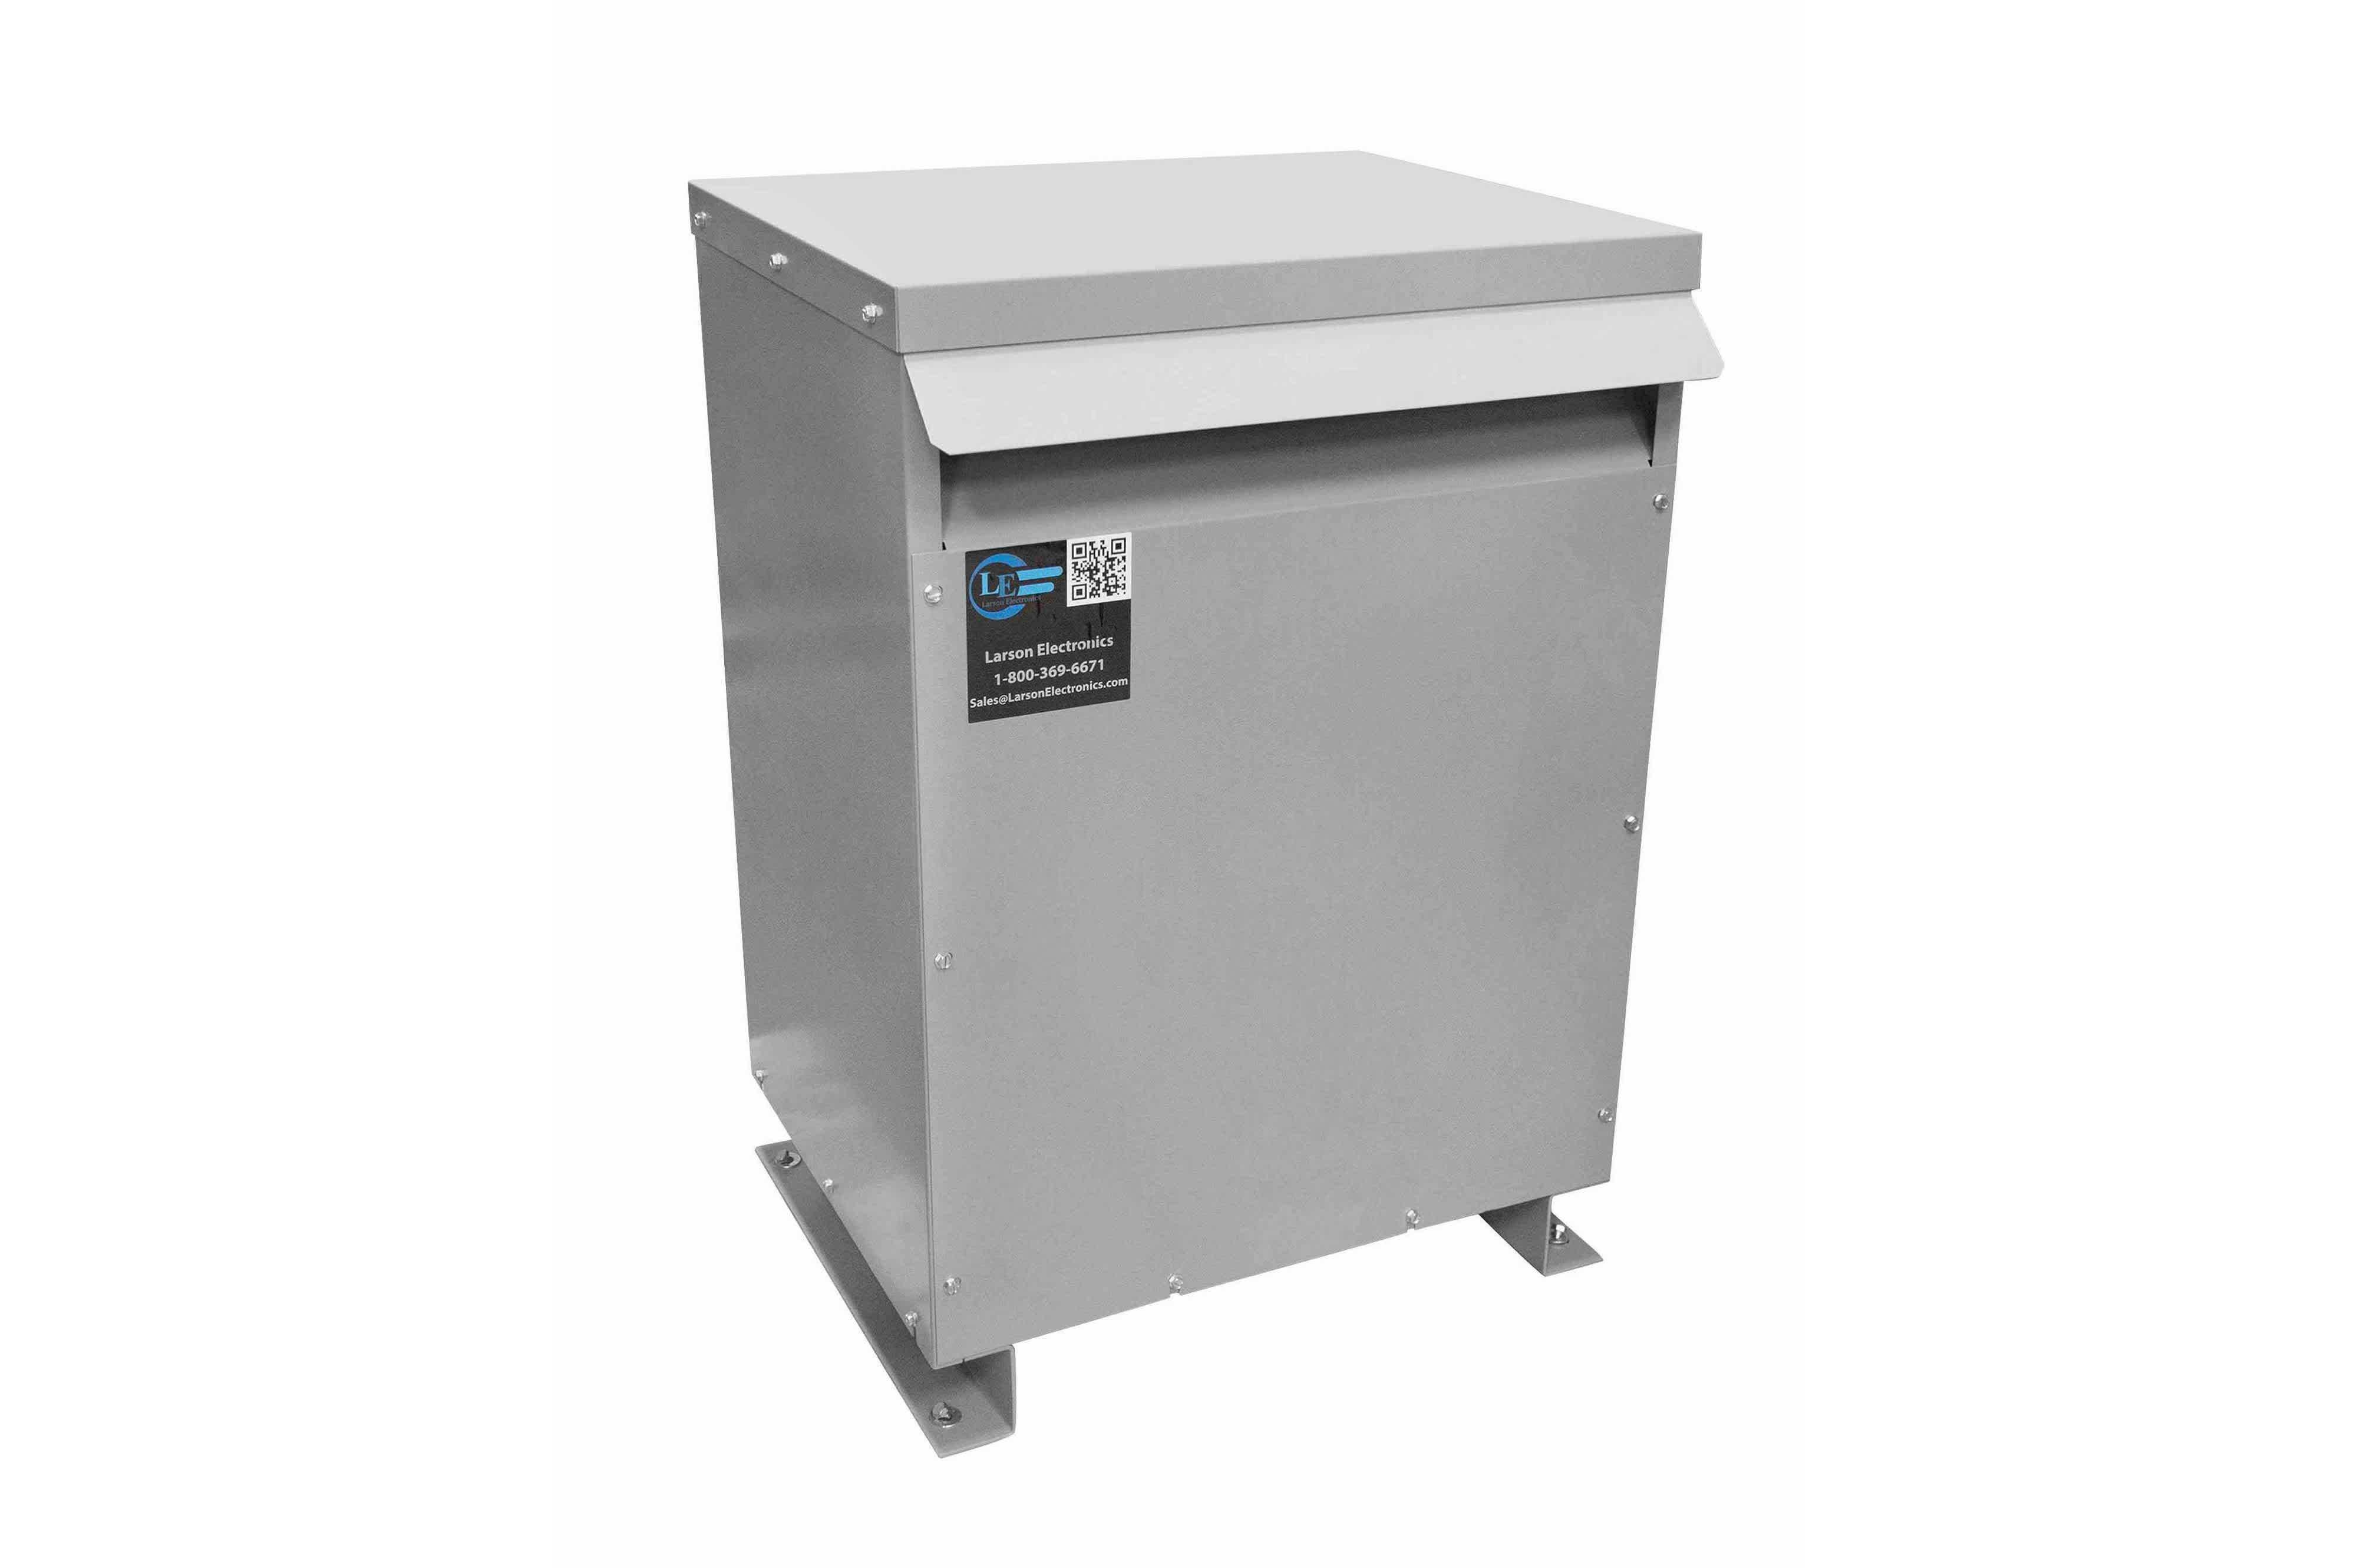 30 kVA 3PH Isolation Transformer, 380V Wye Primary, 240V Delta Secondary, N3R, Ventilated, 60 Hz